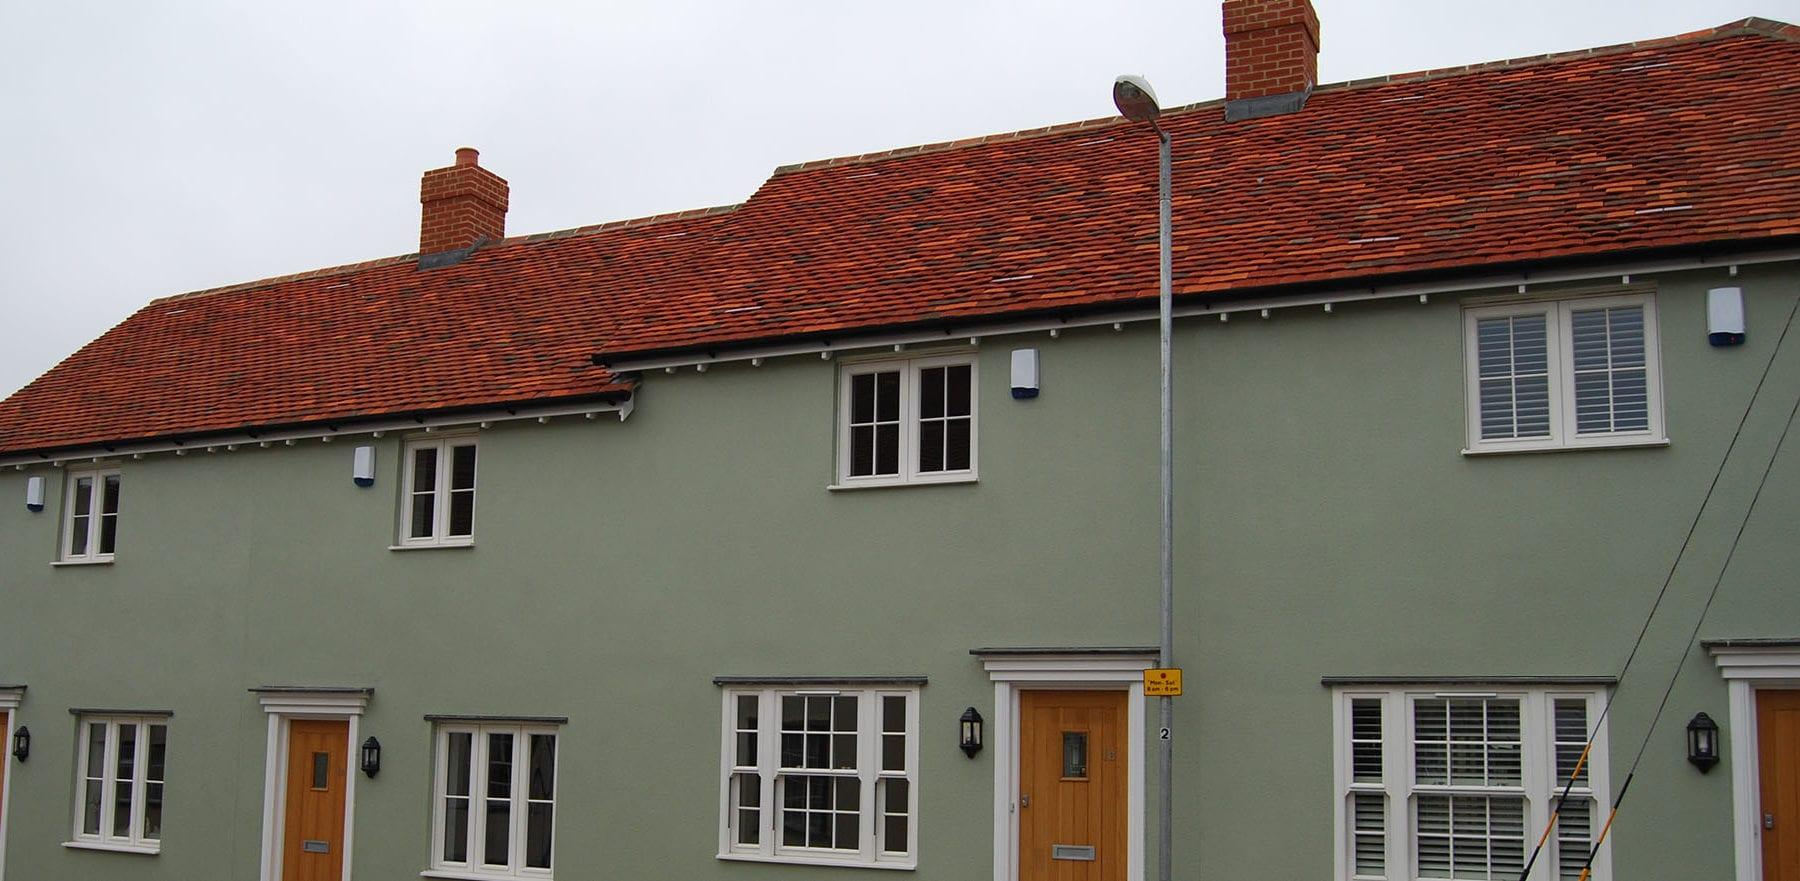 Lifestiles - Handmade Multi Clay Roof Tiles - New Street, England 2